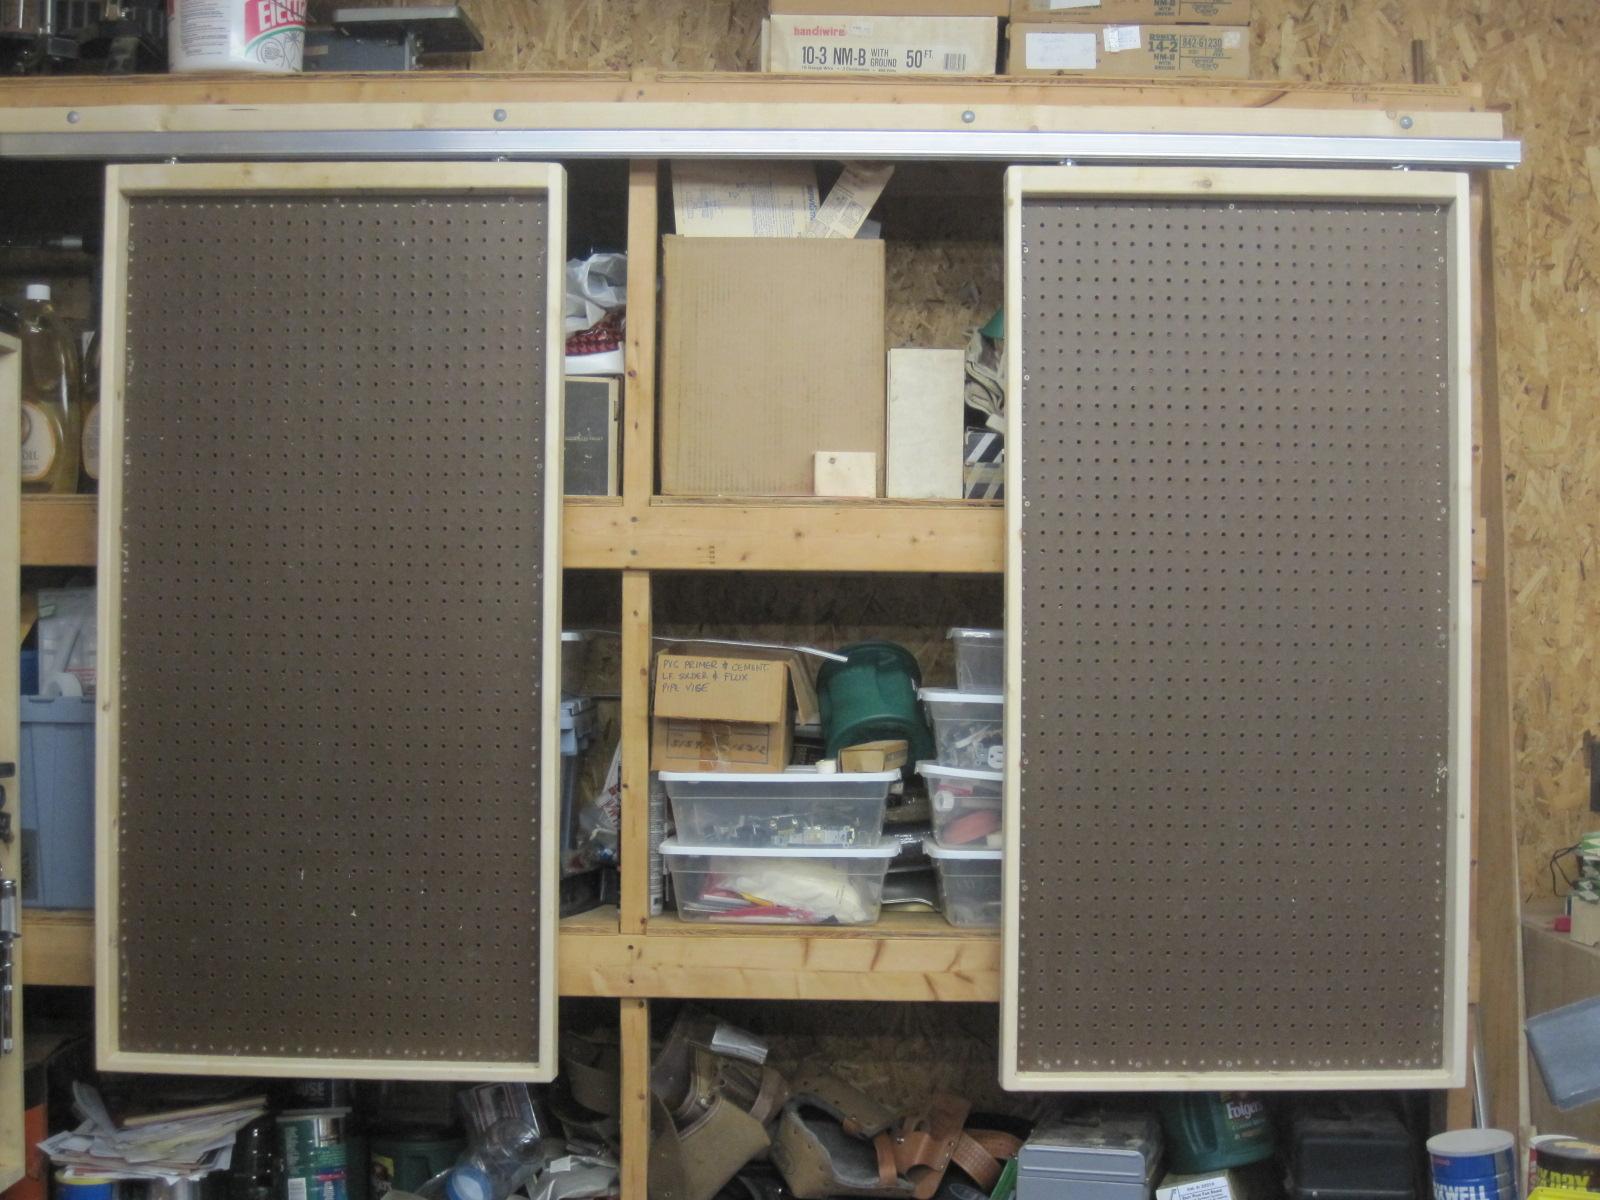 2x4 garage shelves help - Router Forums